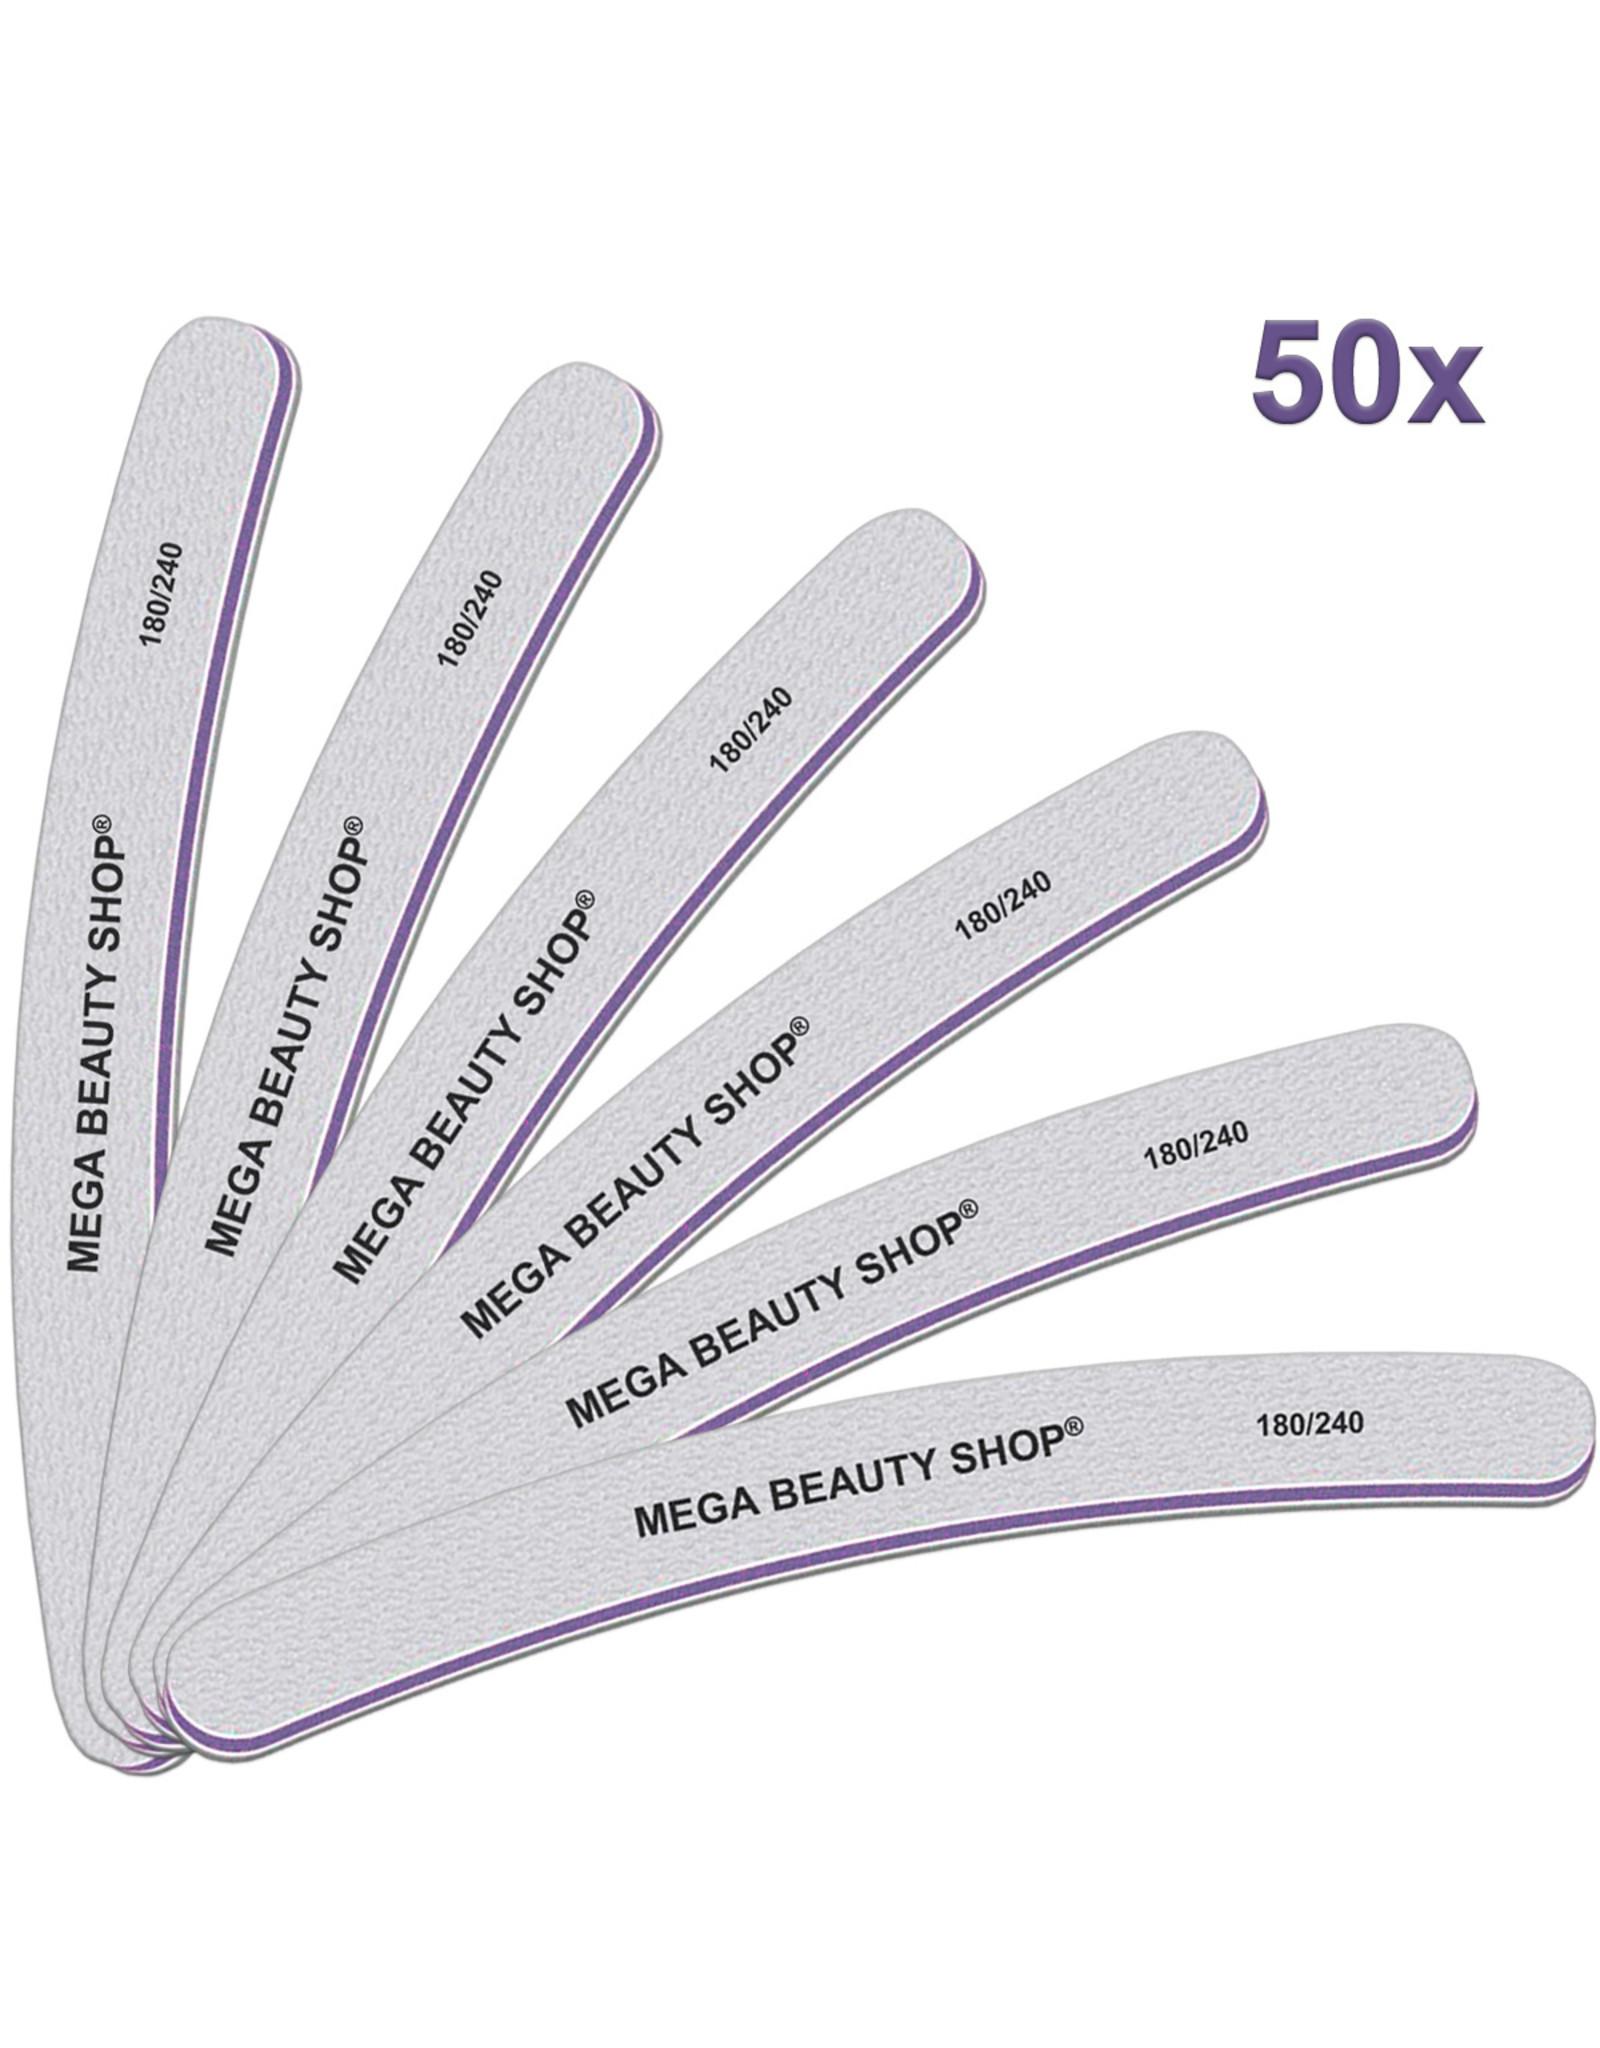 Mega Beauty Shop® PRO  Banana  vijlen zebra  180/240   50st.